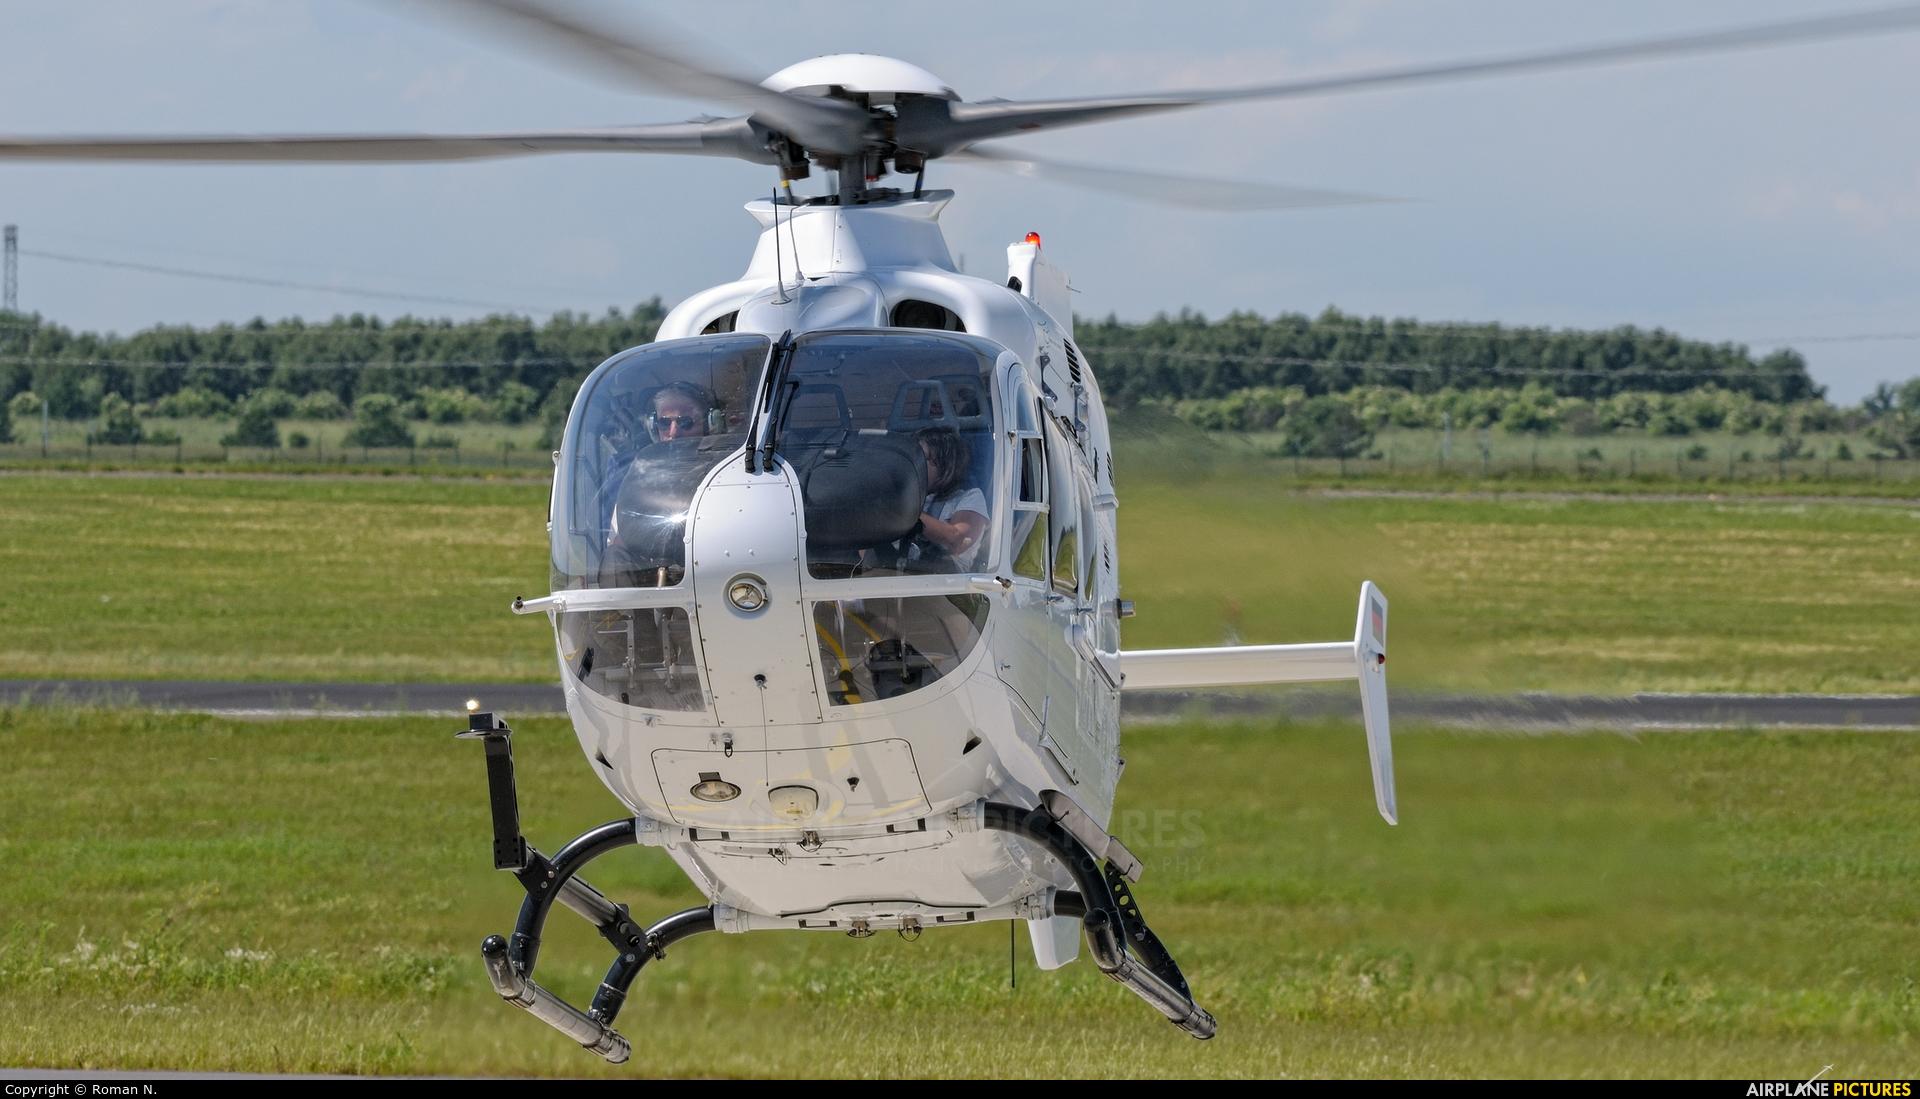 HTM - Helicopter Travel Munich D-HEOY aircraft at Berlin - Schönefeld